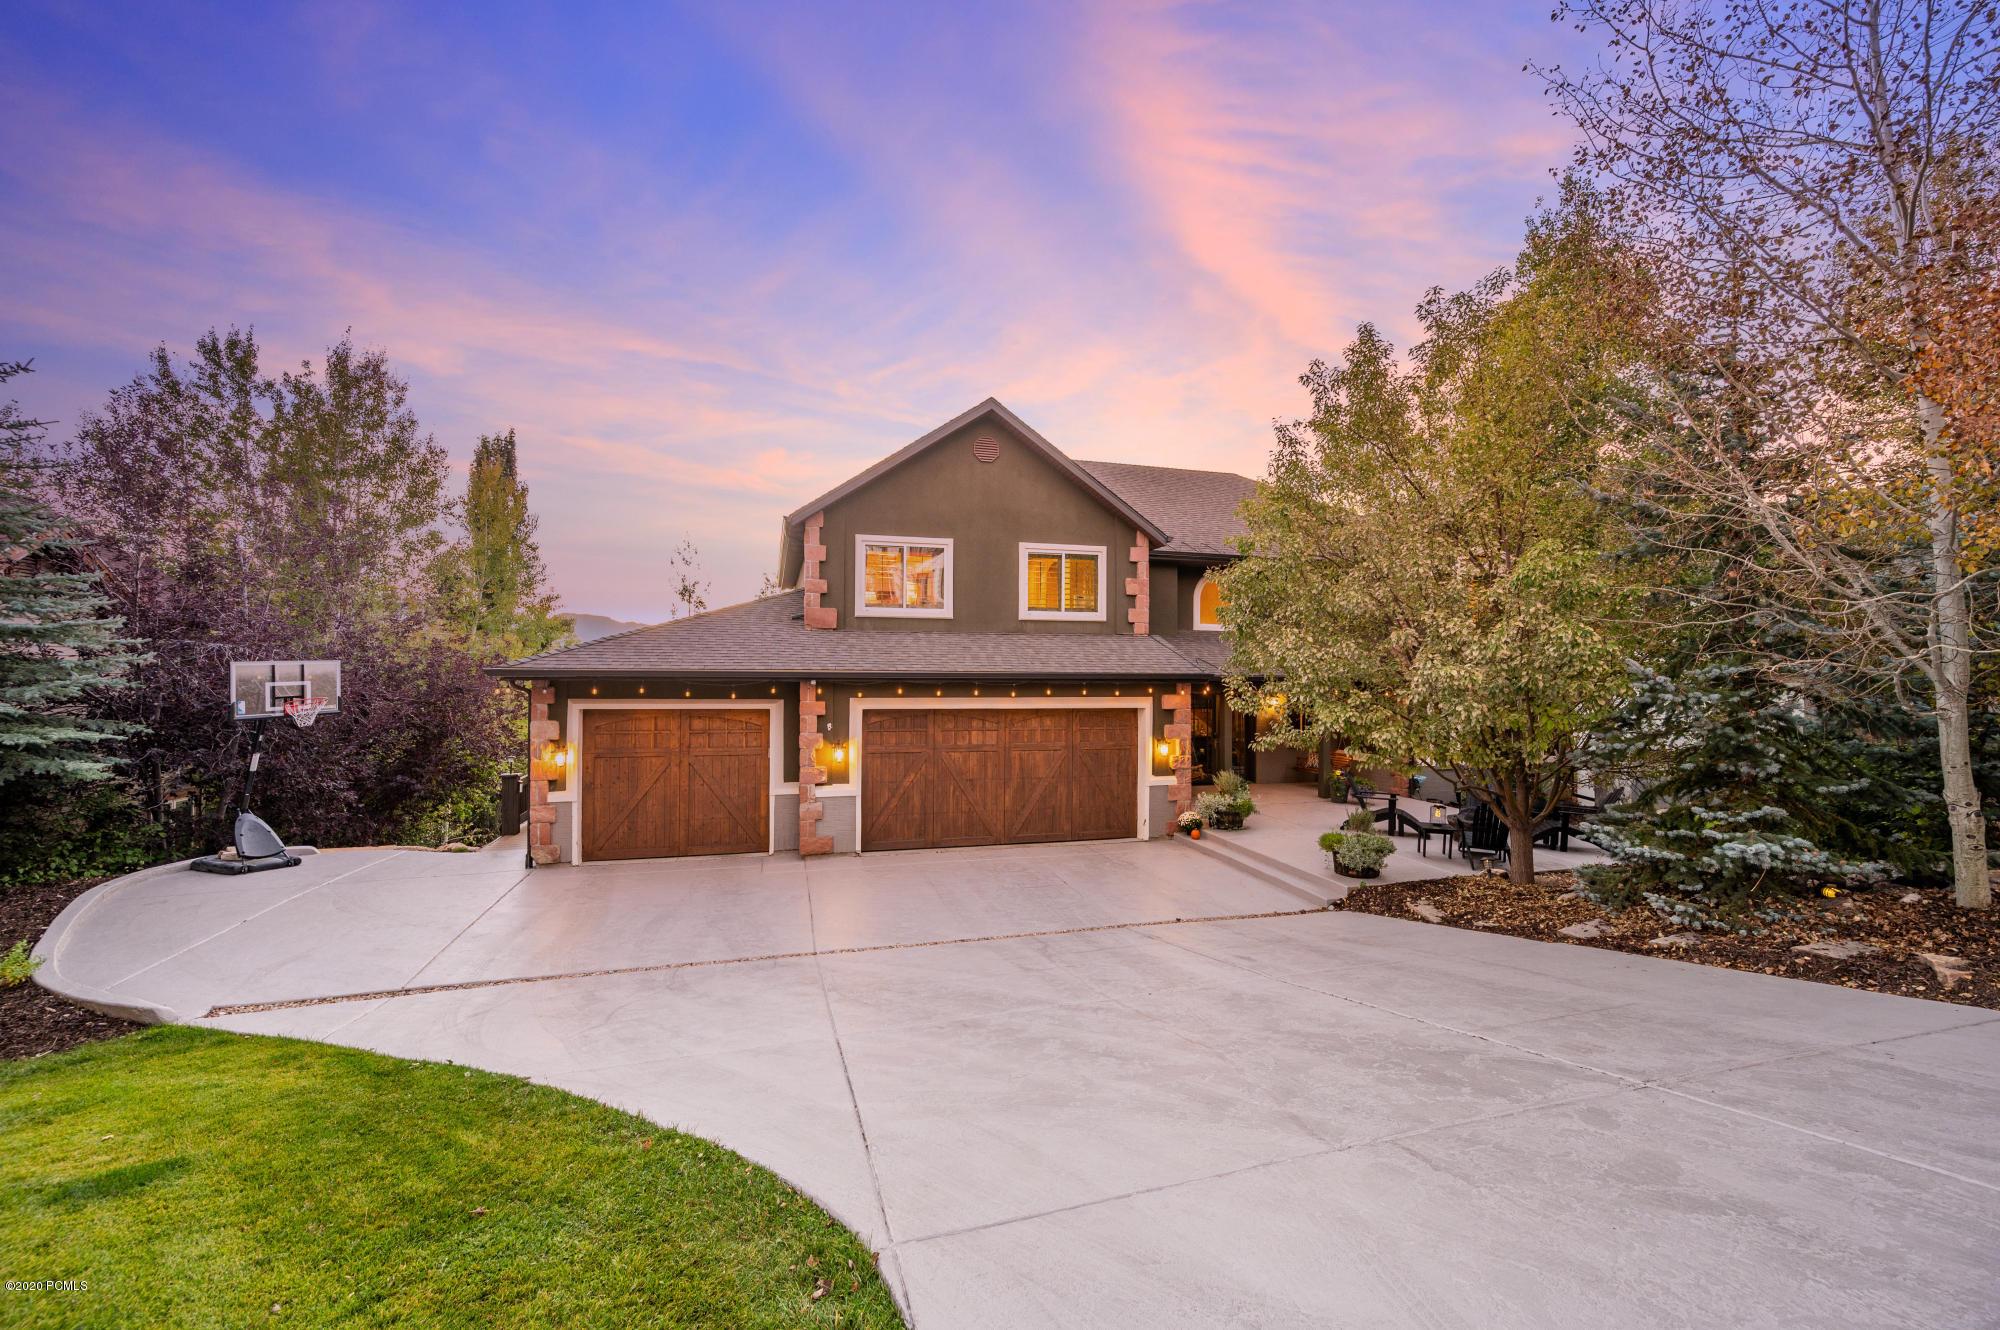 8963 Daybreaker Dr., Park City, Utah 84098, 6 Bedrooms Bedrooms, ,5 BathroomsBathrooms,Single Family,For Sale,Daybreaker Dr.,12003740